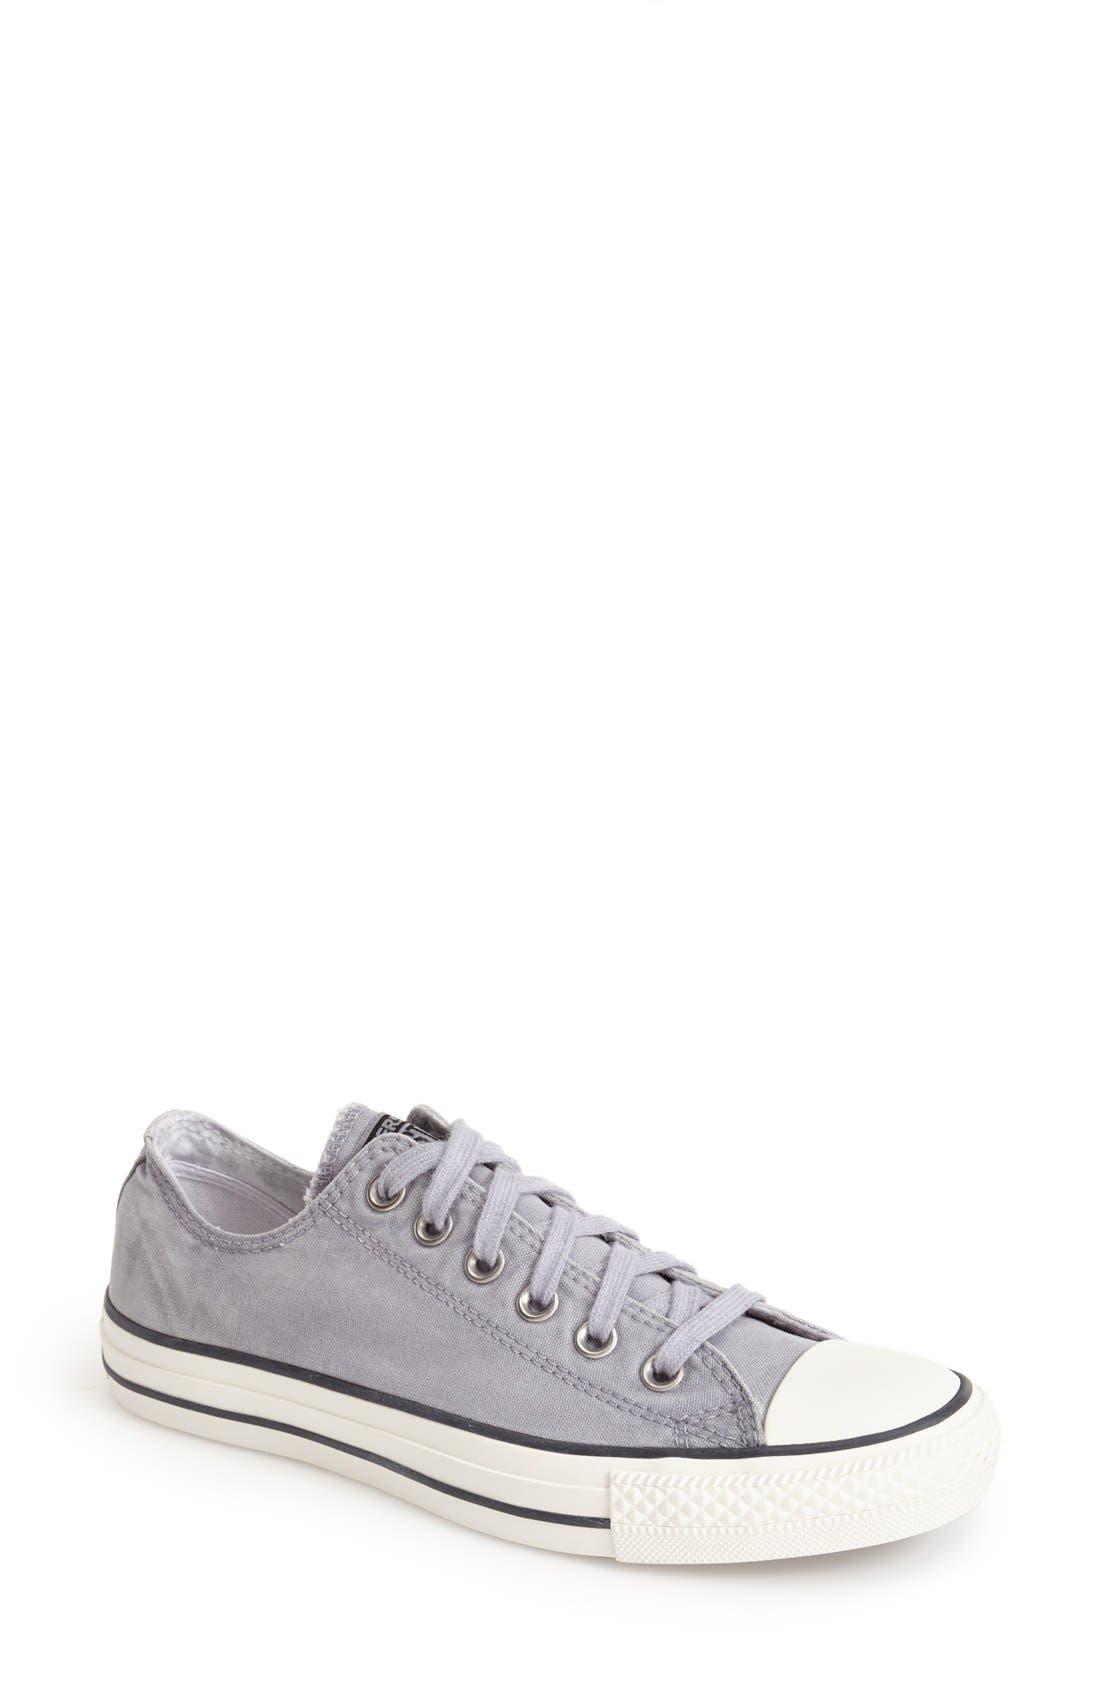 Main Image - Converse Chuck Taylor® All Star® 'White Wash Ox' Sneaker (Women)